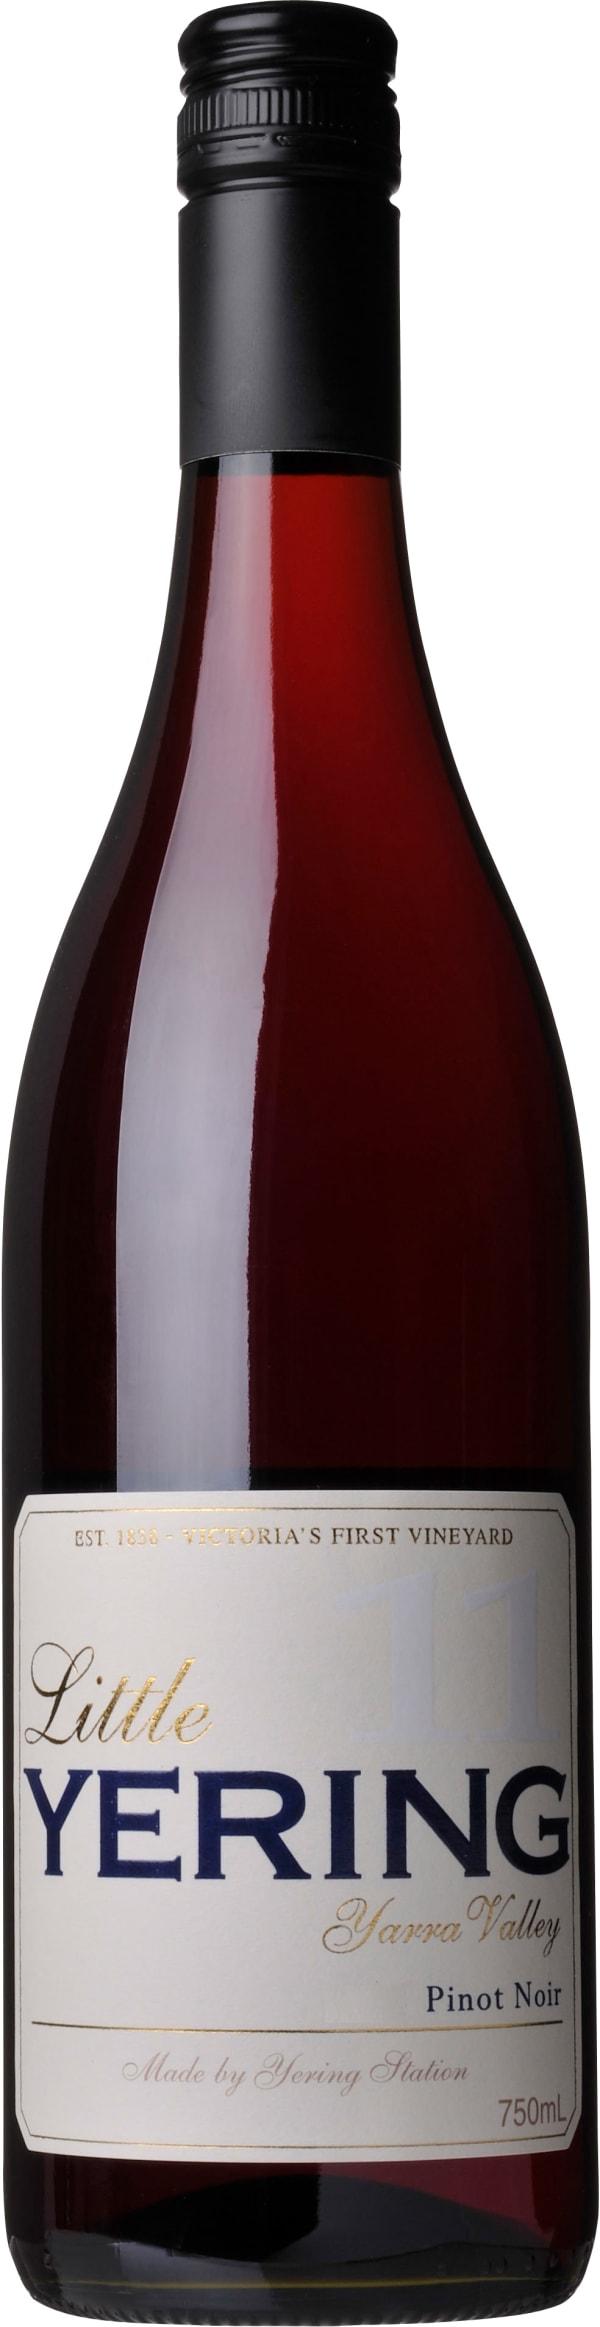 Little Yering Pinot Noir 2016